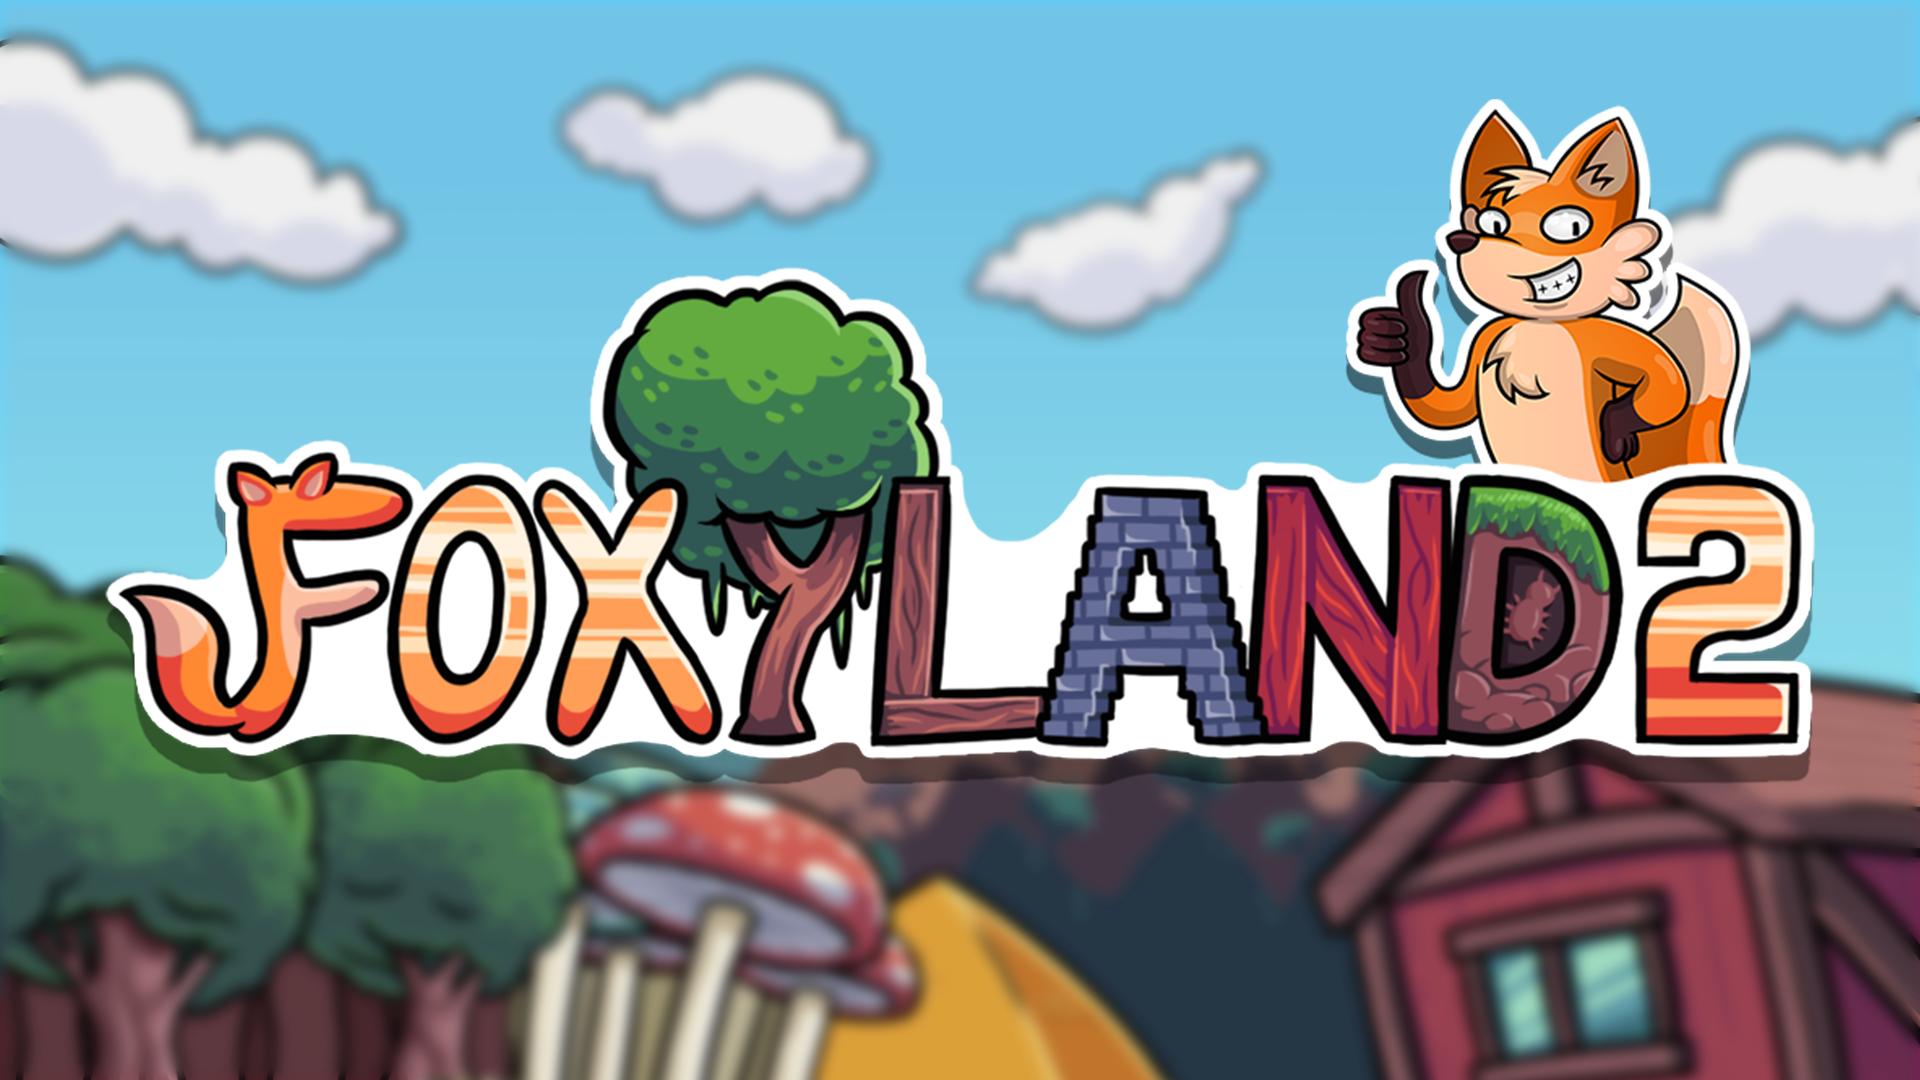 foxyland 2 logo wallpaper 69971